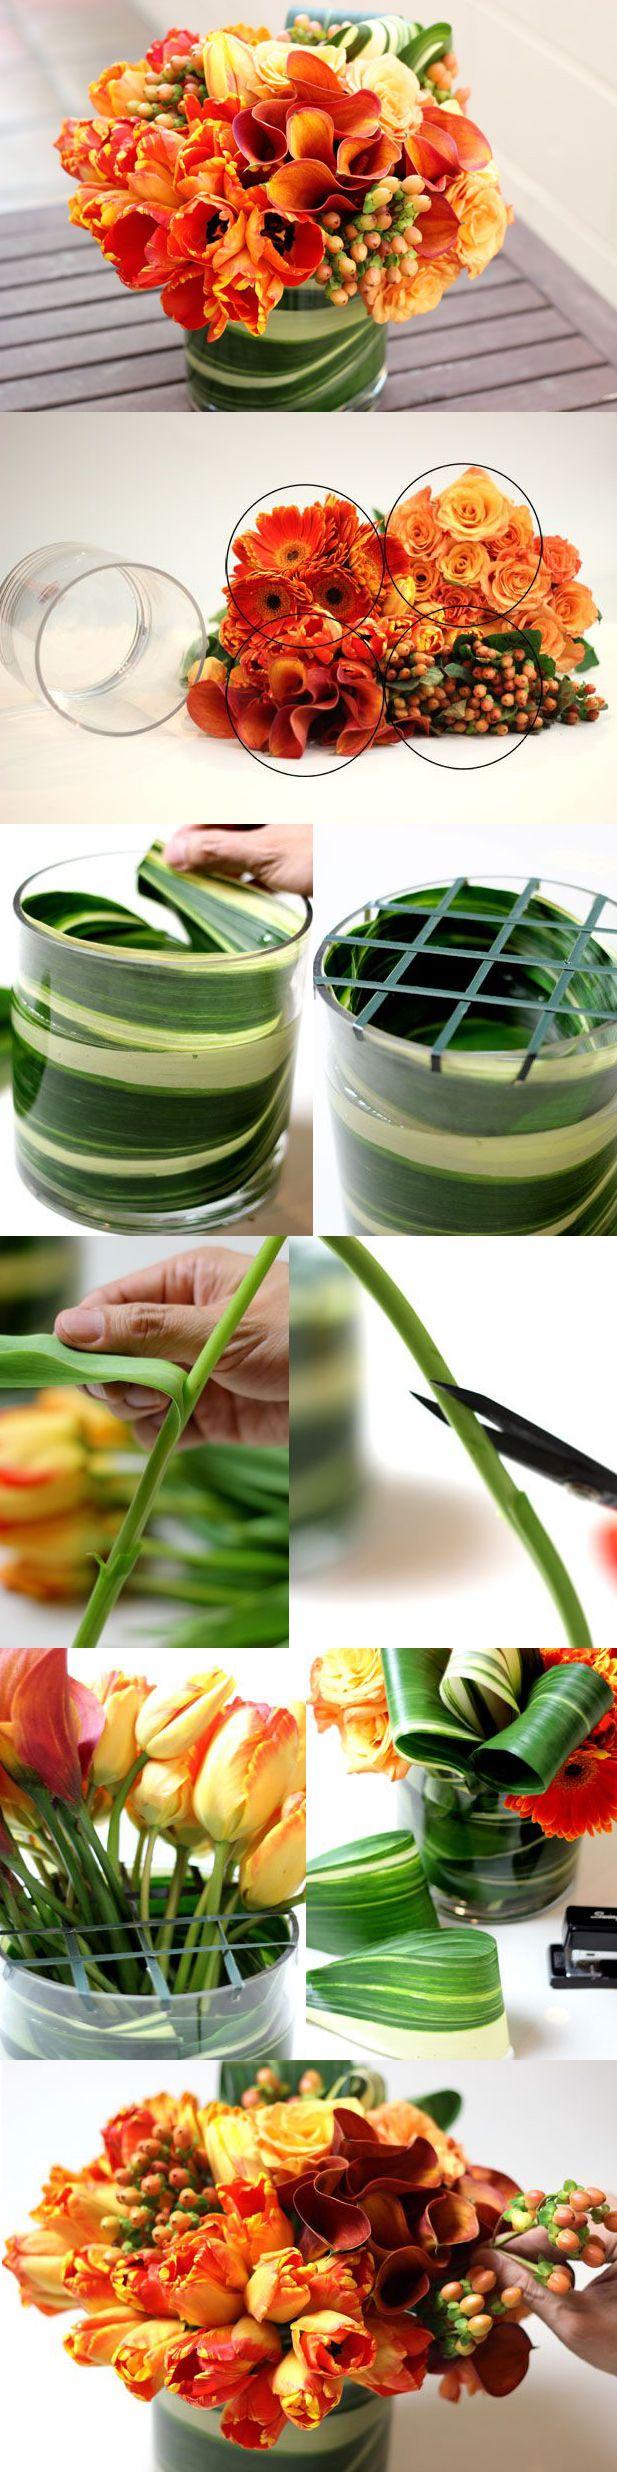 Arrange like a pro in 10 easy steps! by ehow #DIY #Flower_Arranging